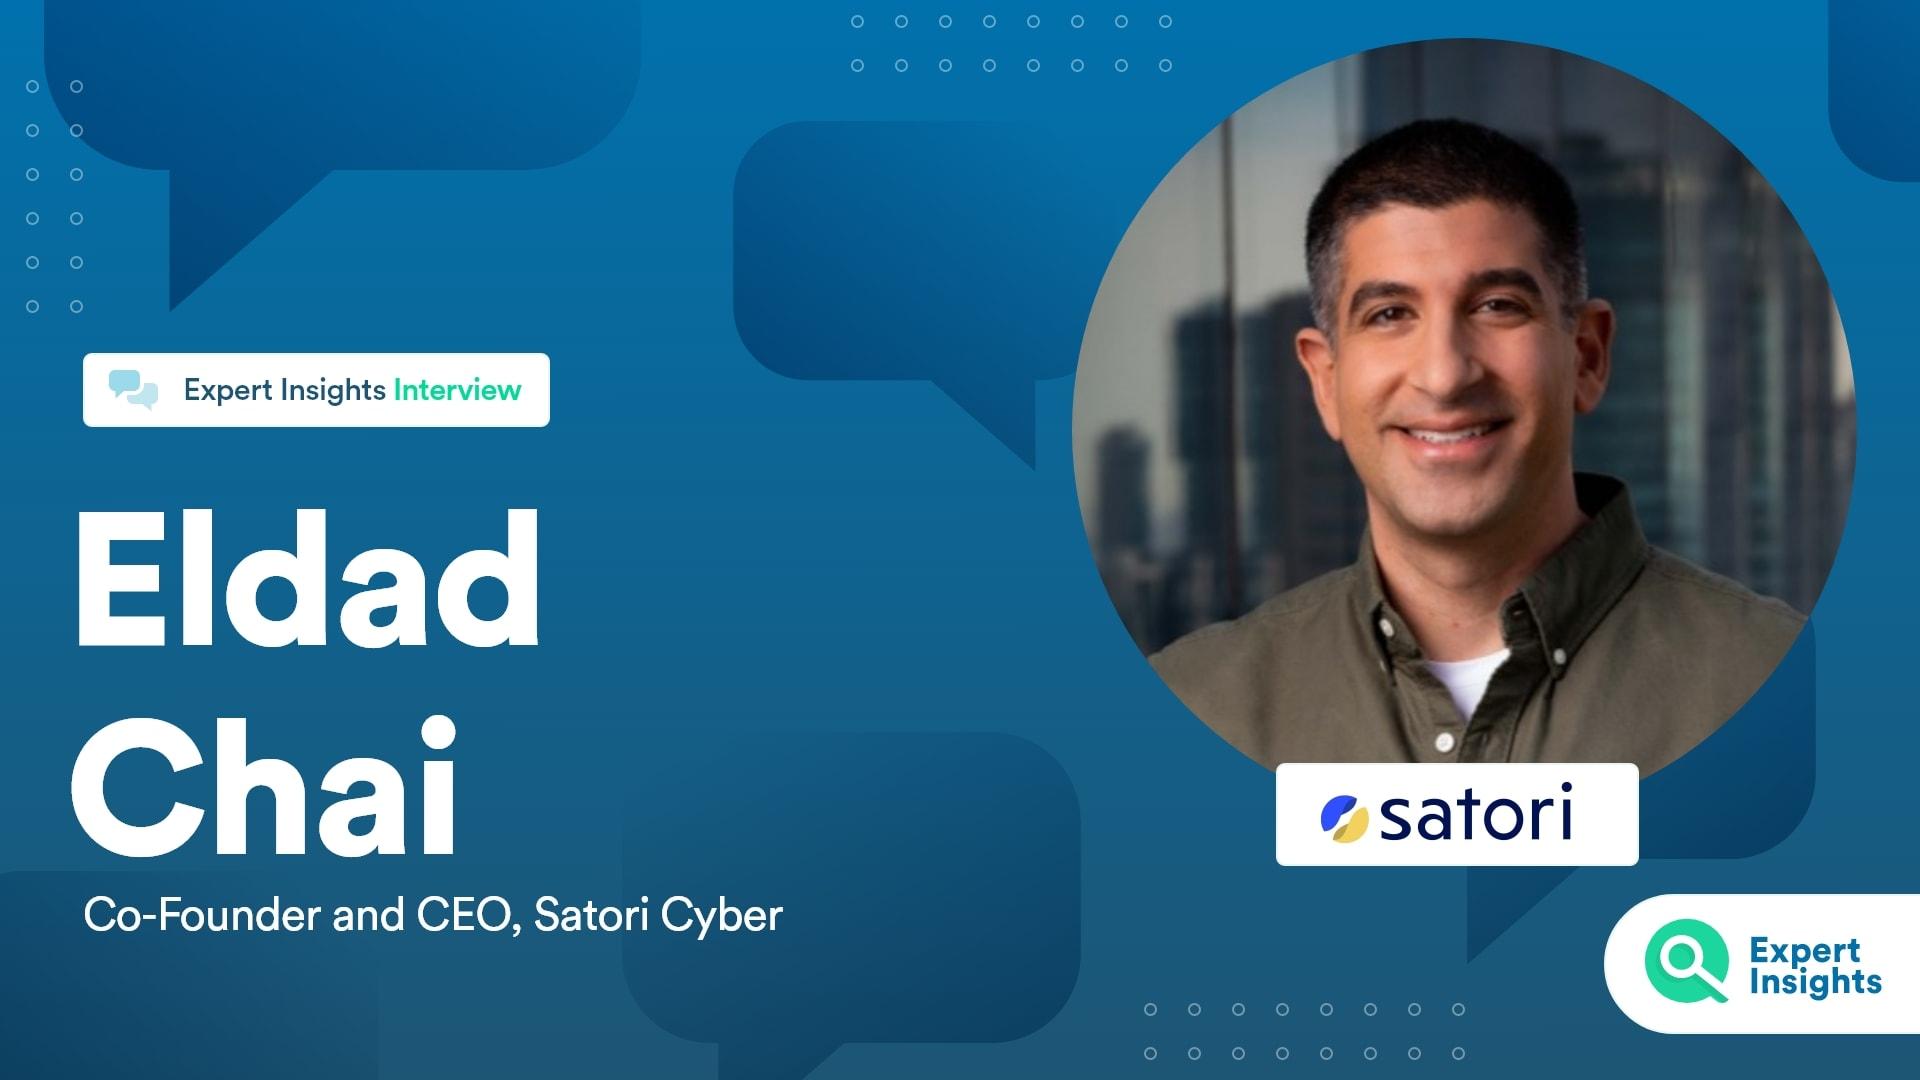 Expert Insights Interview With Eldad Chai Of Satori Cyber